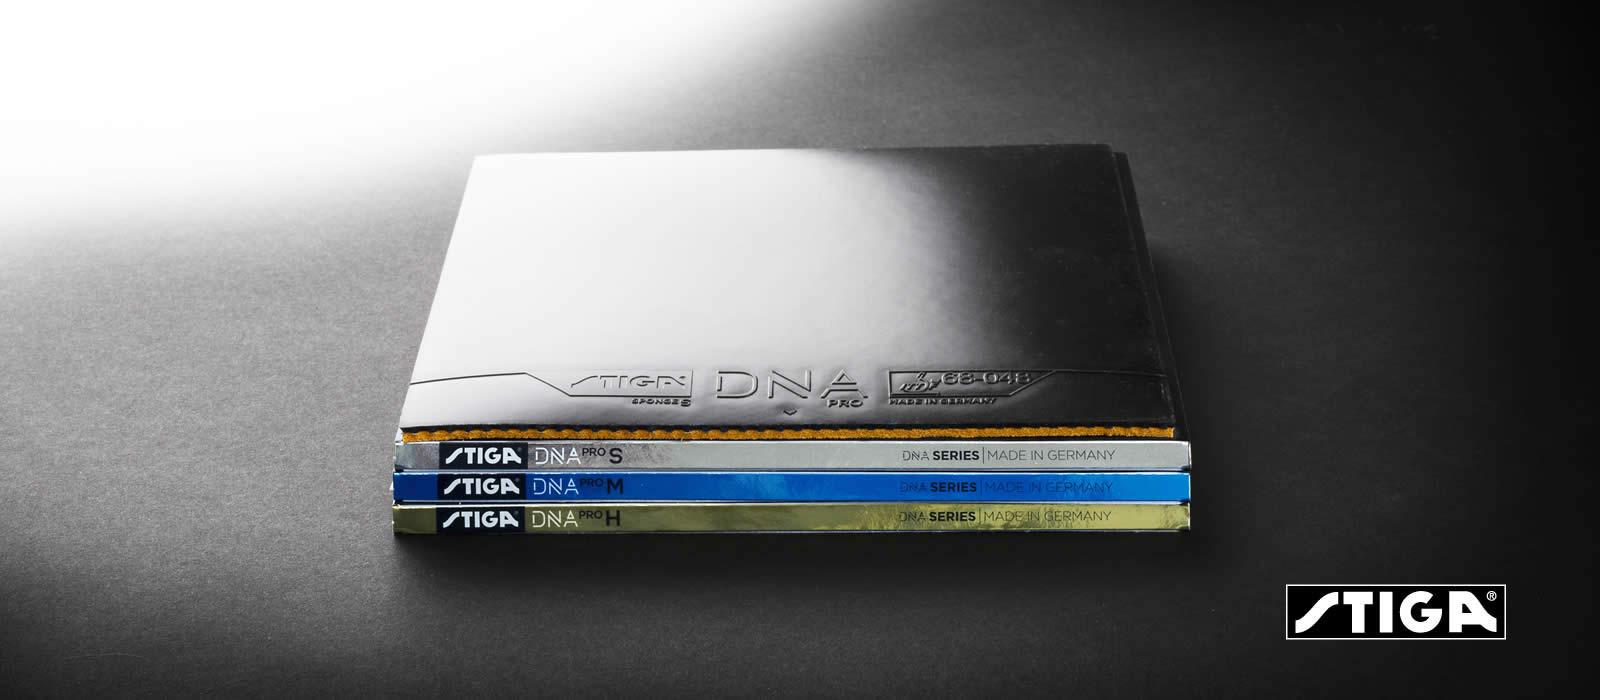 Stiga DNA-Serie